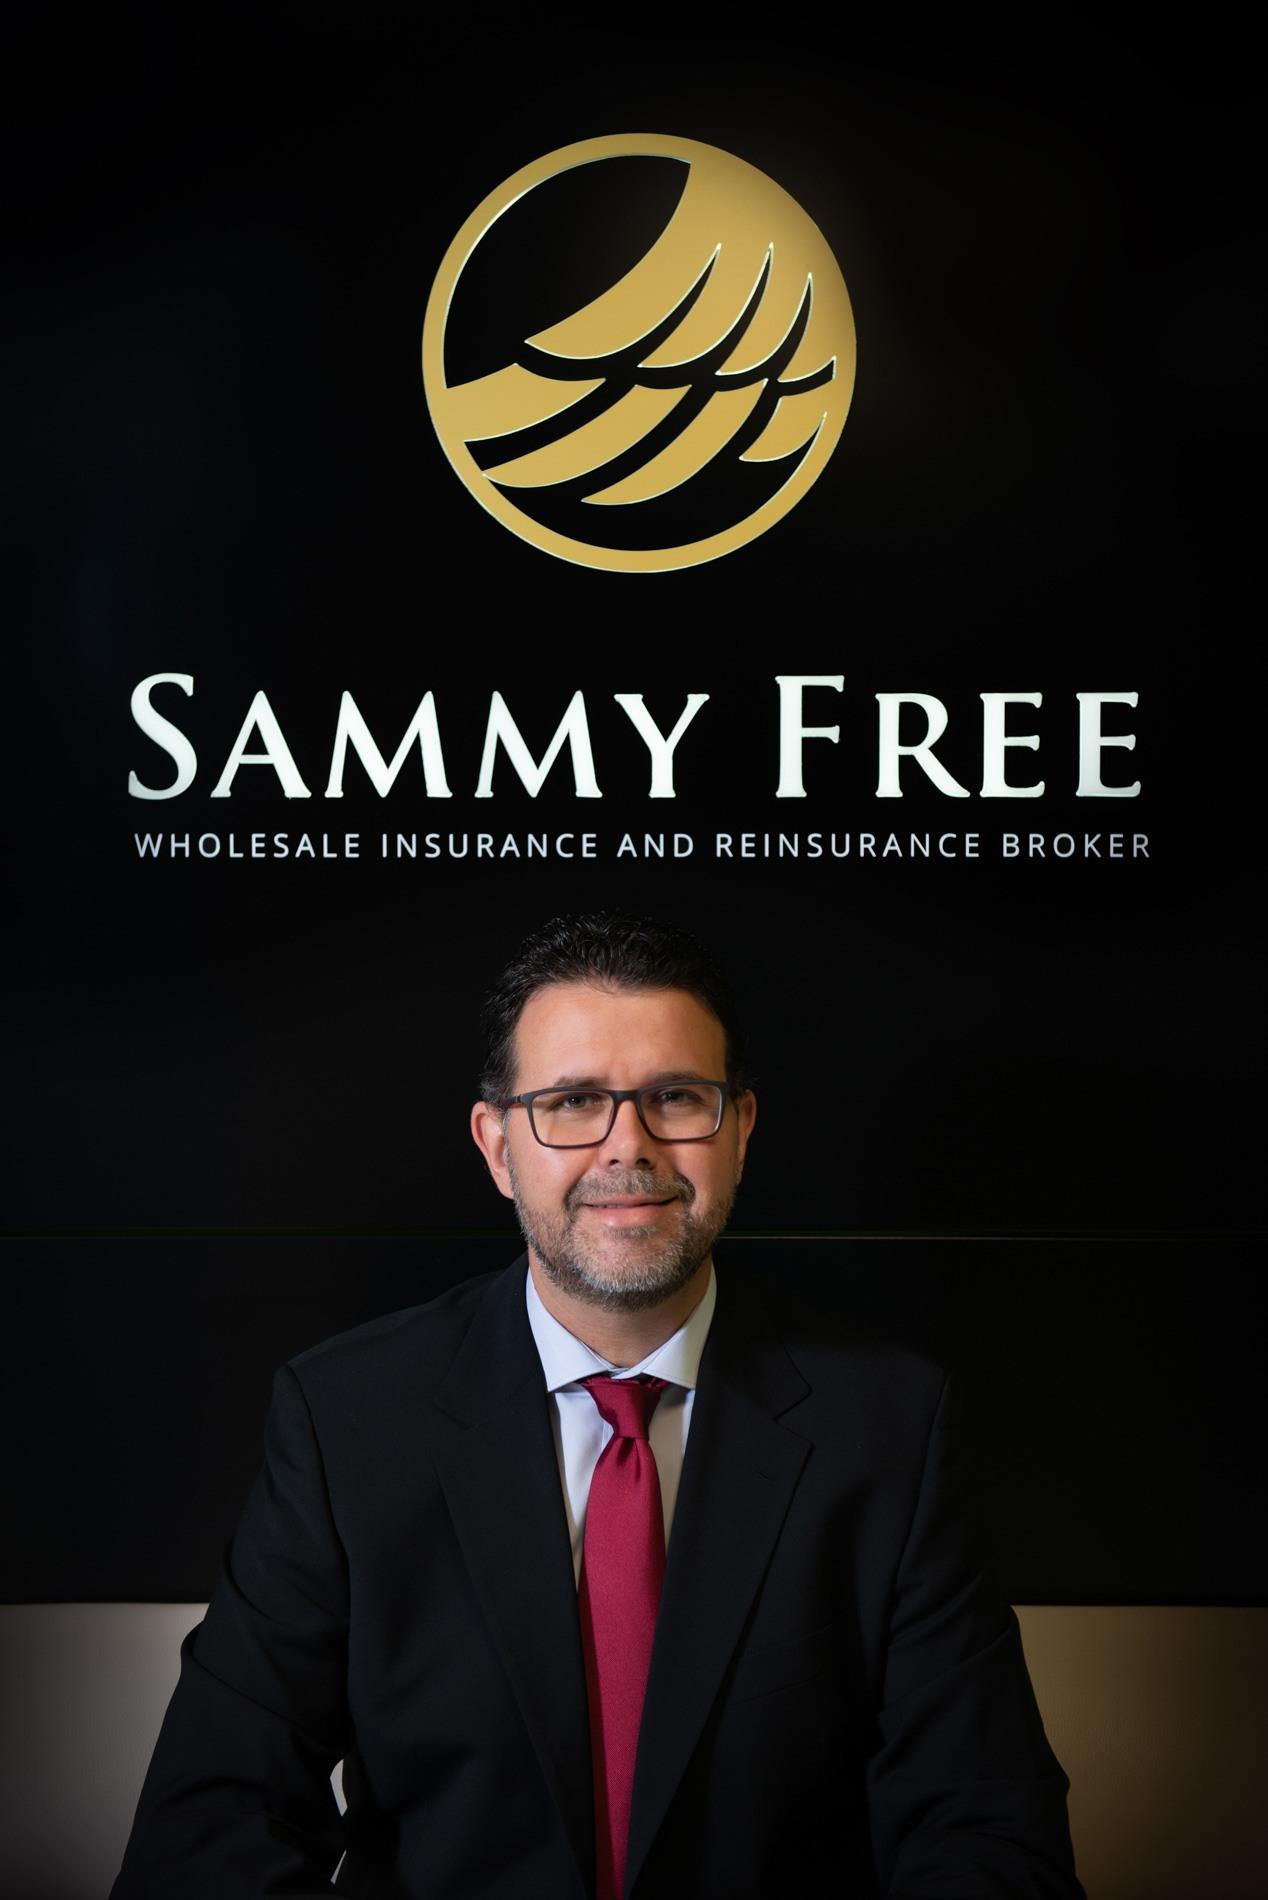 equipo sammy free